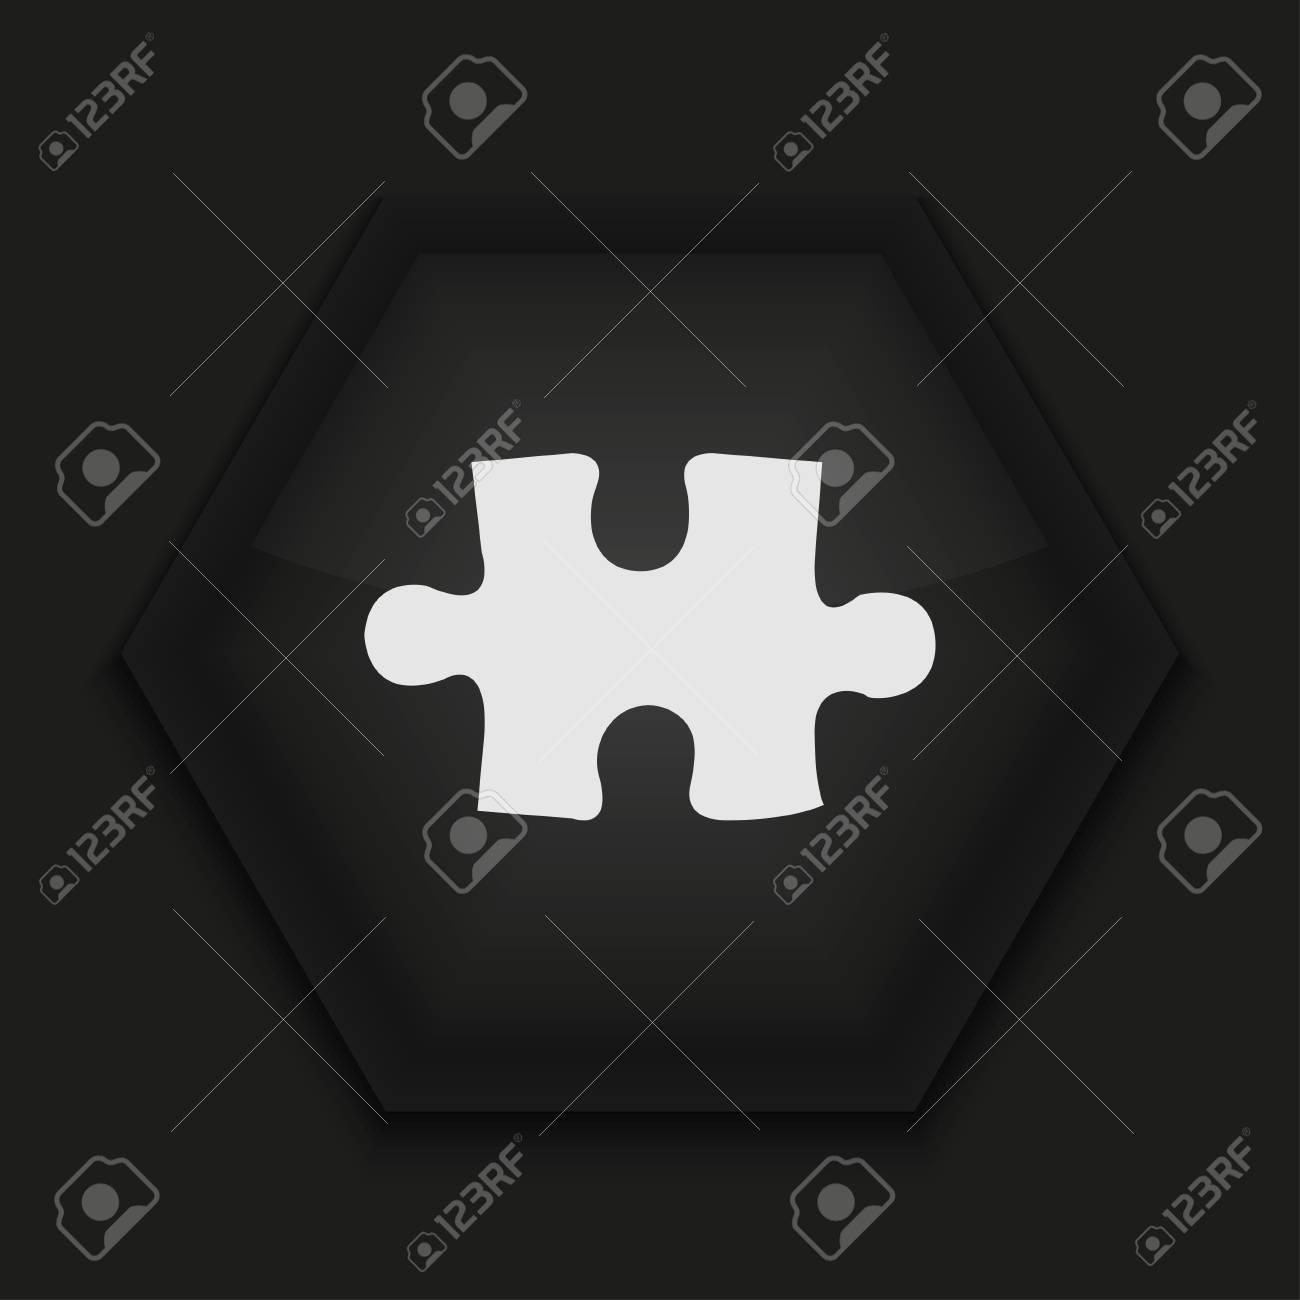 Vector creative icon on black background. Eps10 Stock Vector - 17274219